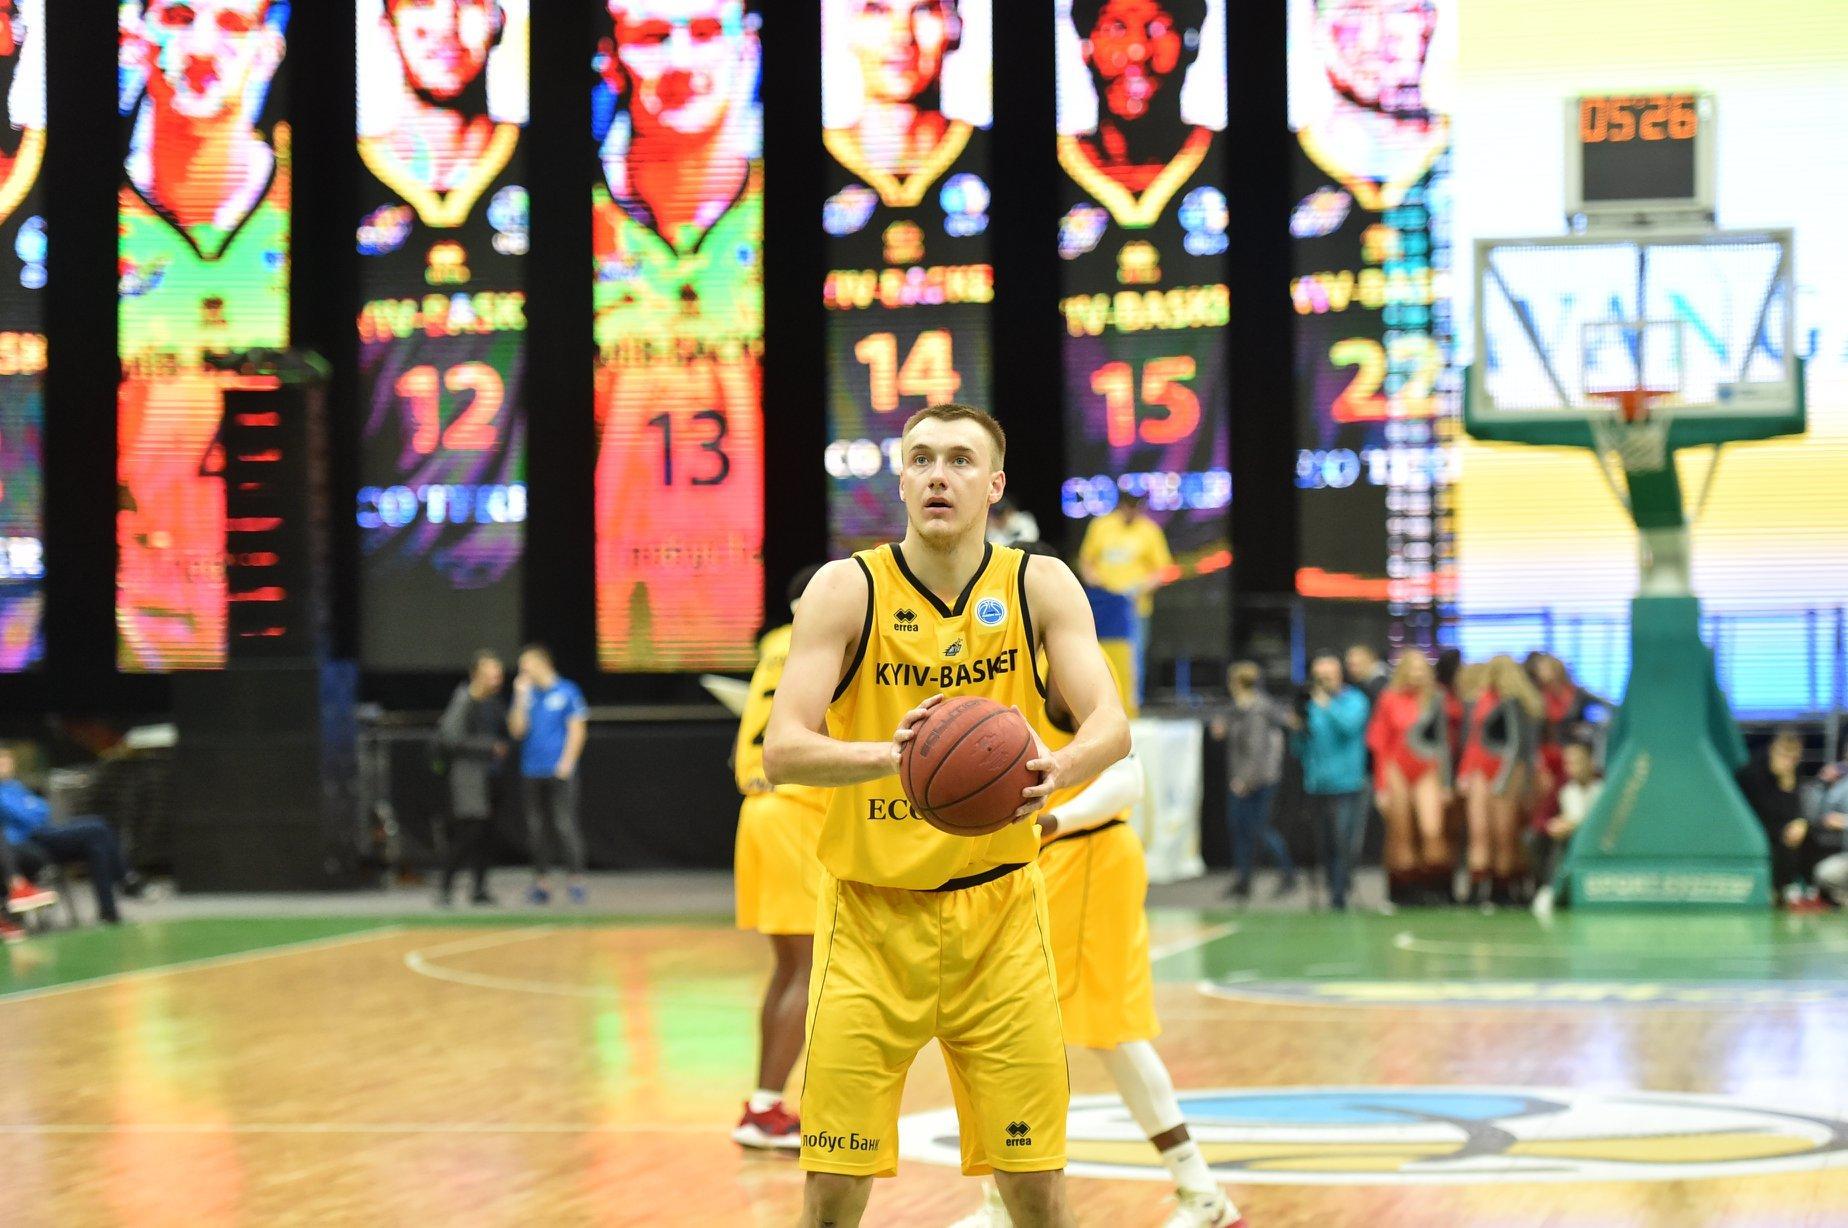 Київ-Баскет проти Зволлє: анонс матчу Кубка Європи FIBA